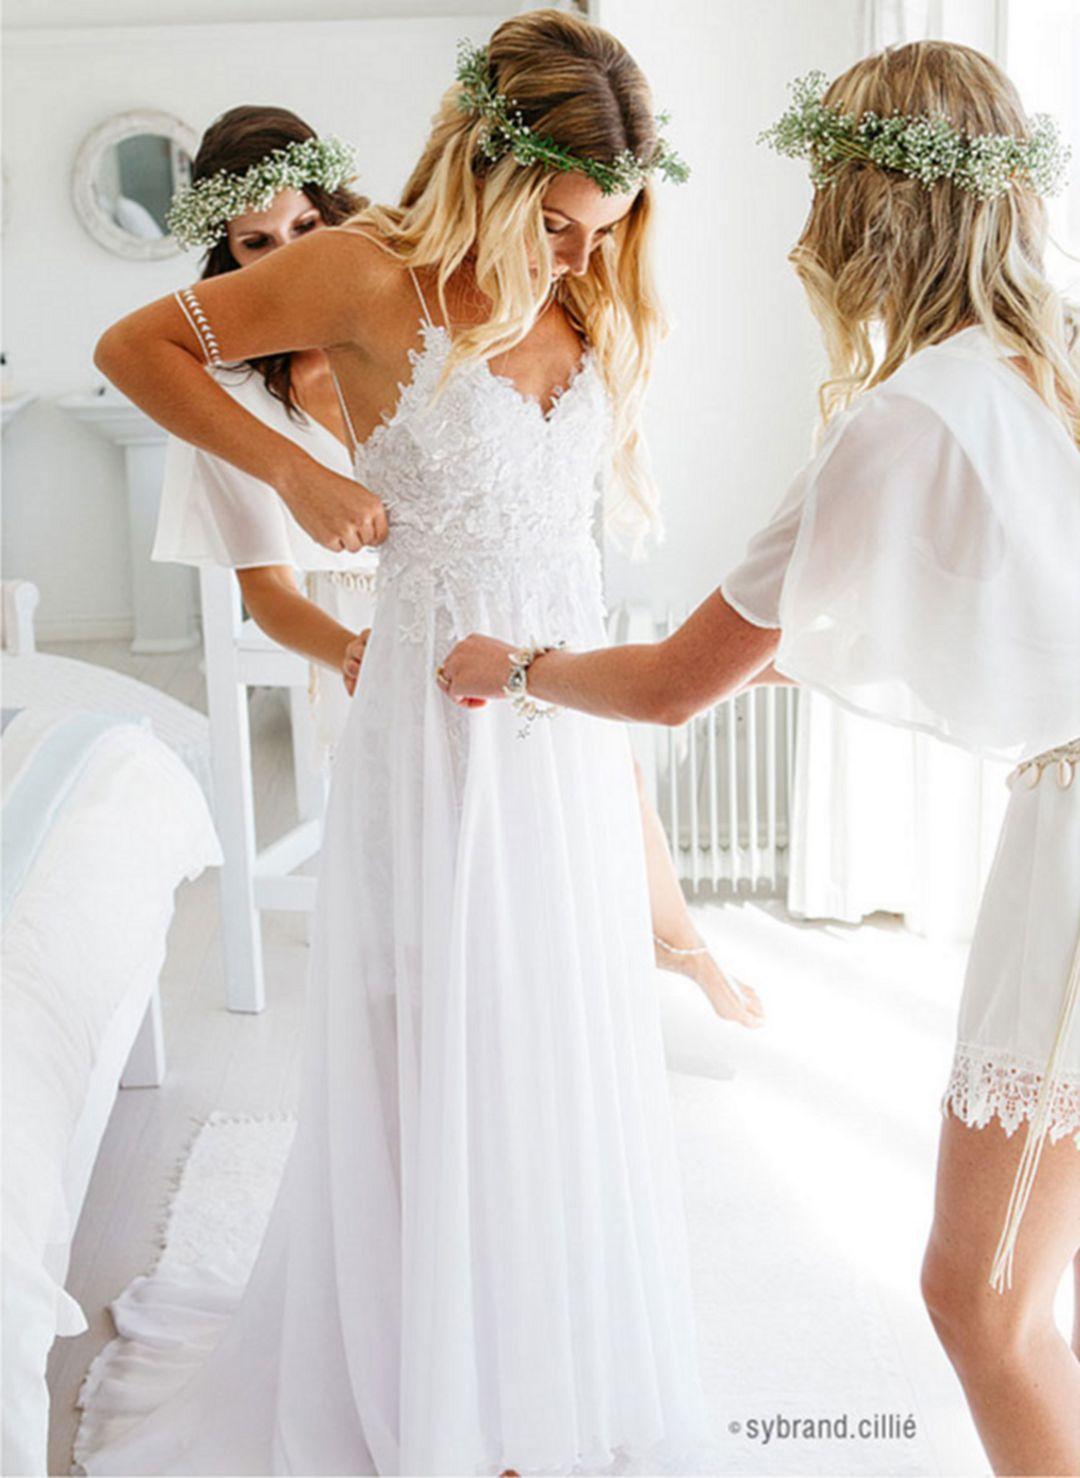 Spaghetti Straps White Long Chiffon Lace Beach Wedding Dresses Wedding Dress Simple Cheap Summer Wedding Gowns Bridal Dresses From 21weddingdresses